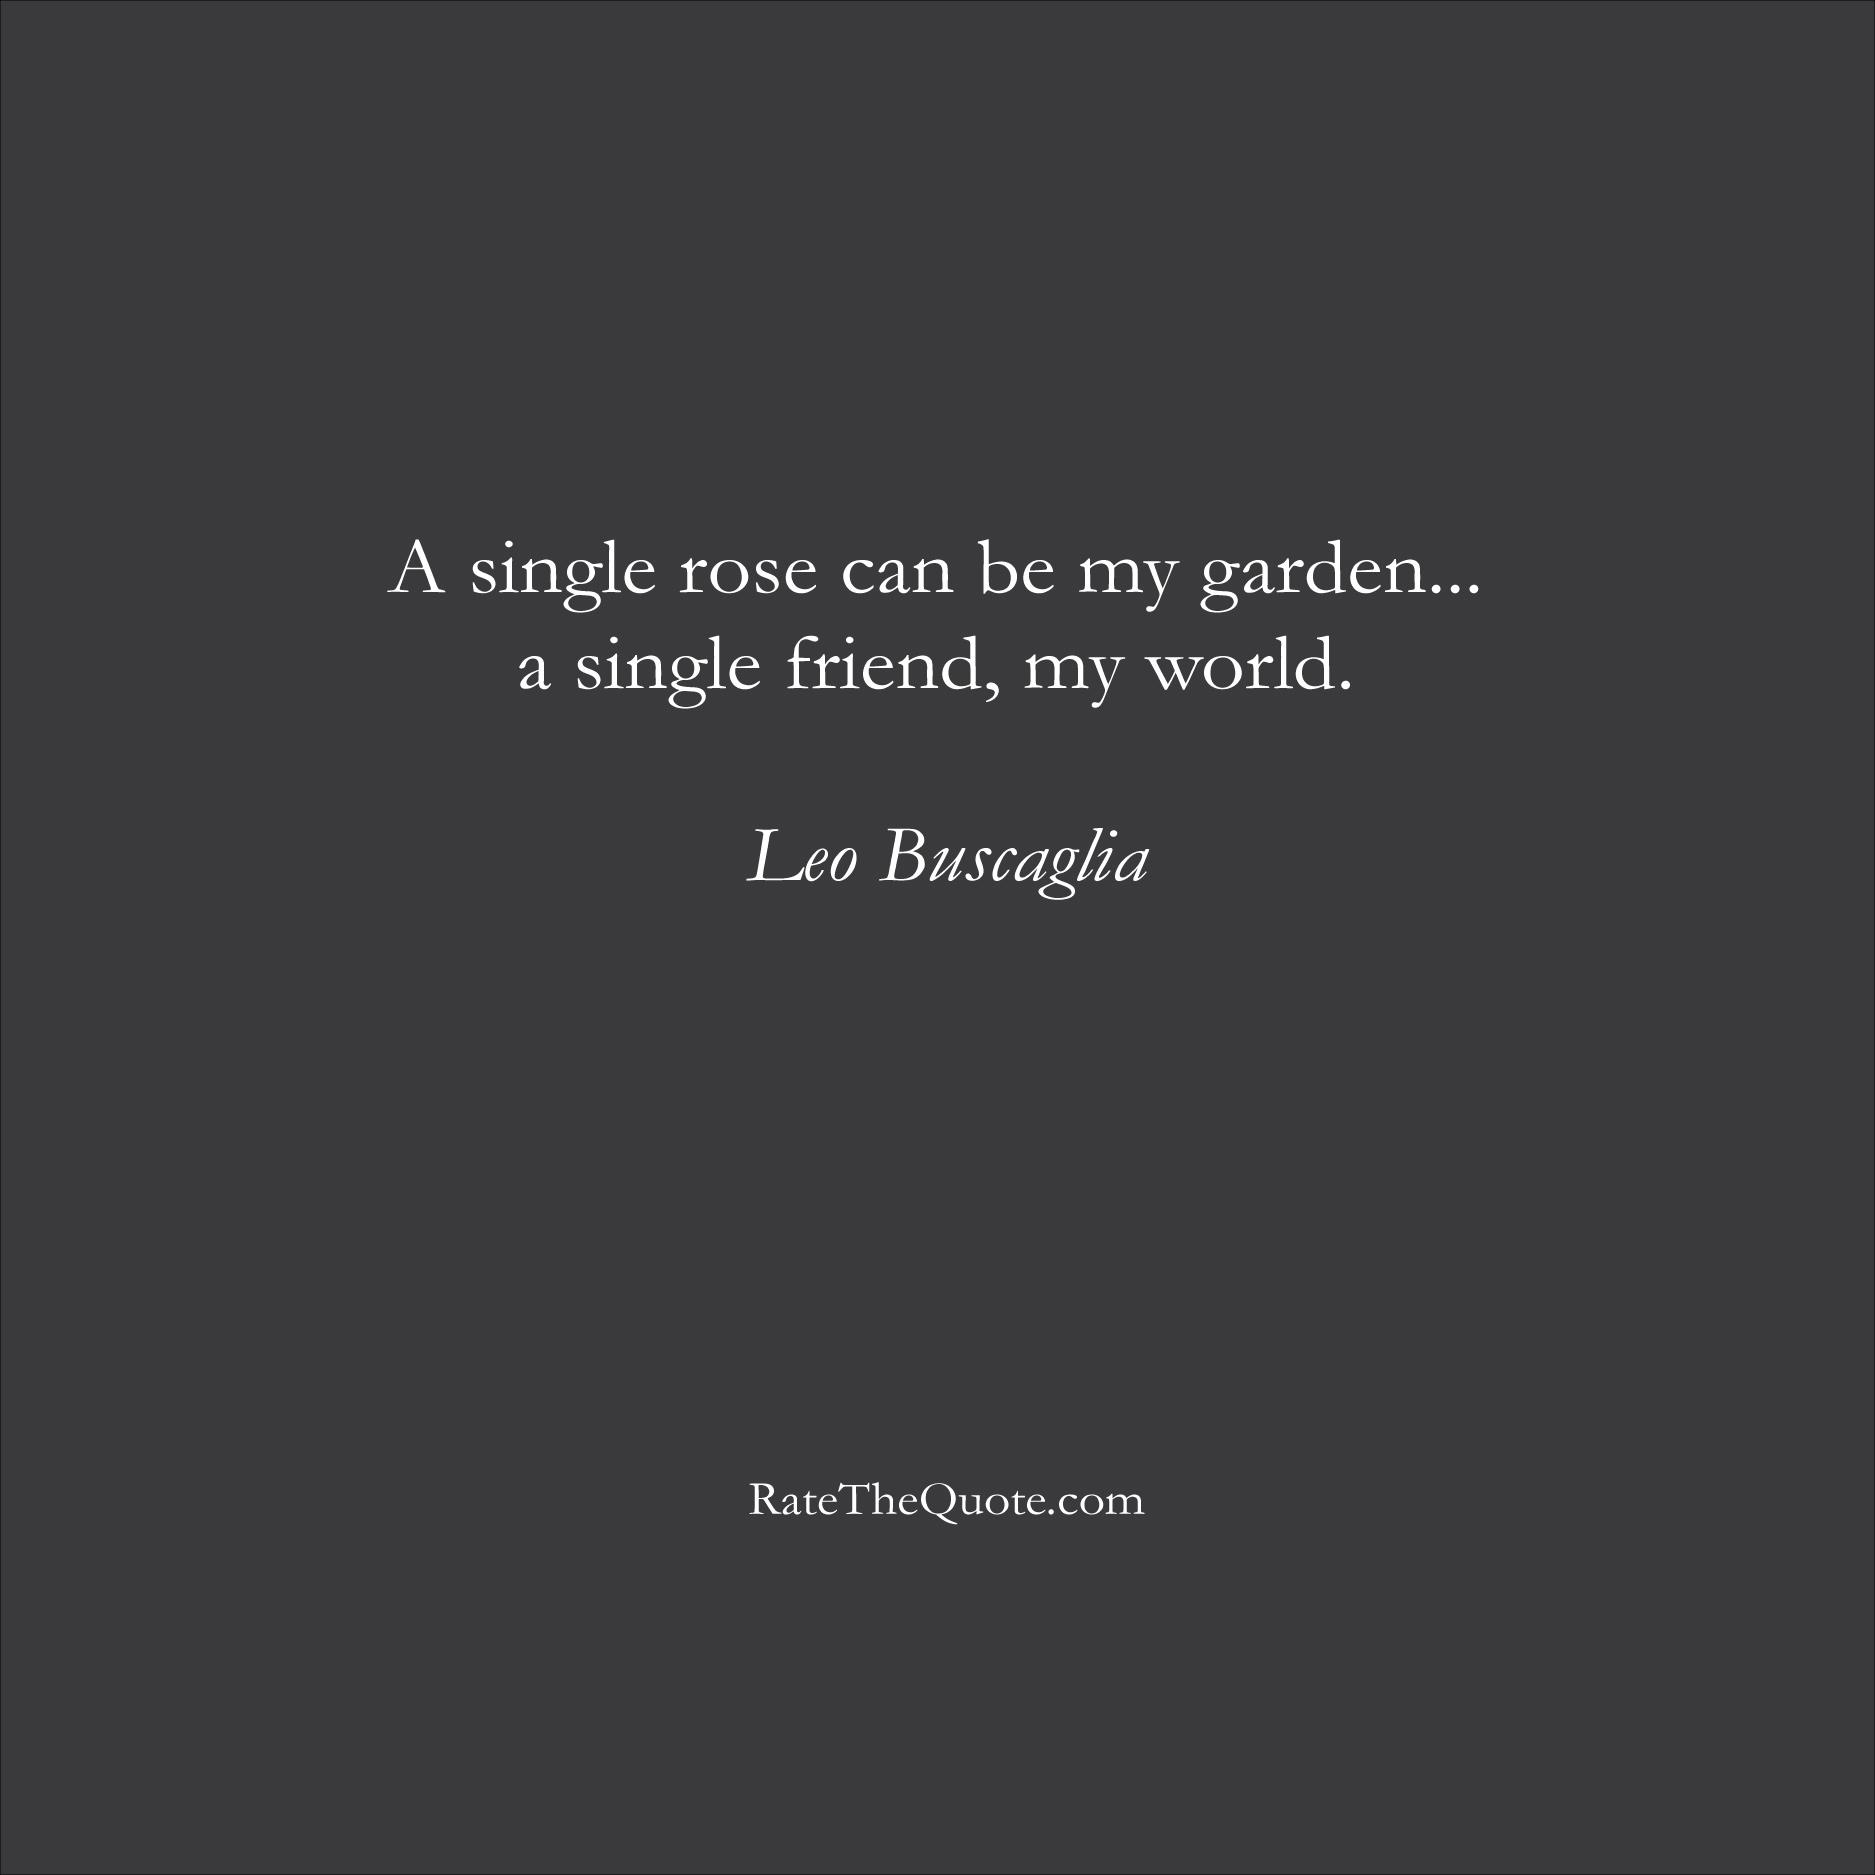 Friendship Quotes Ratethequote